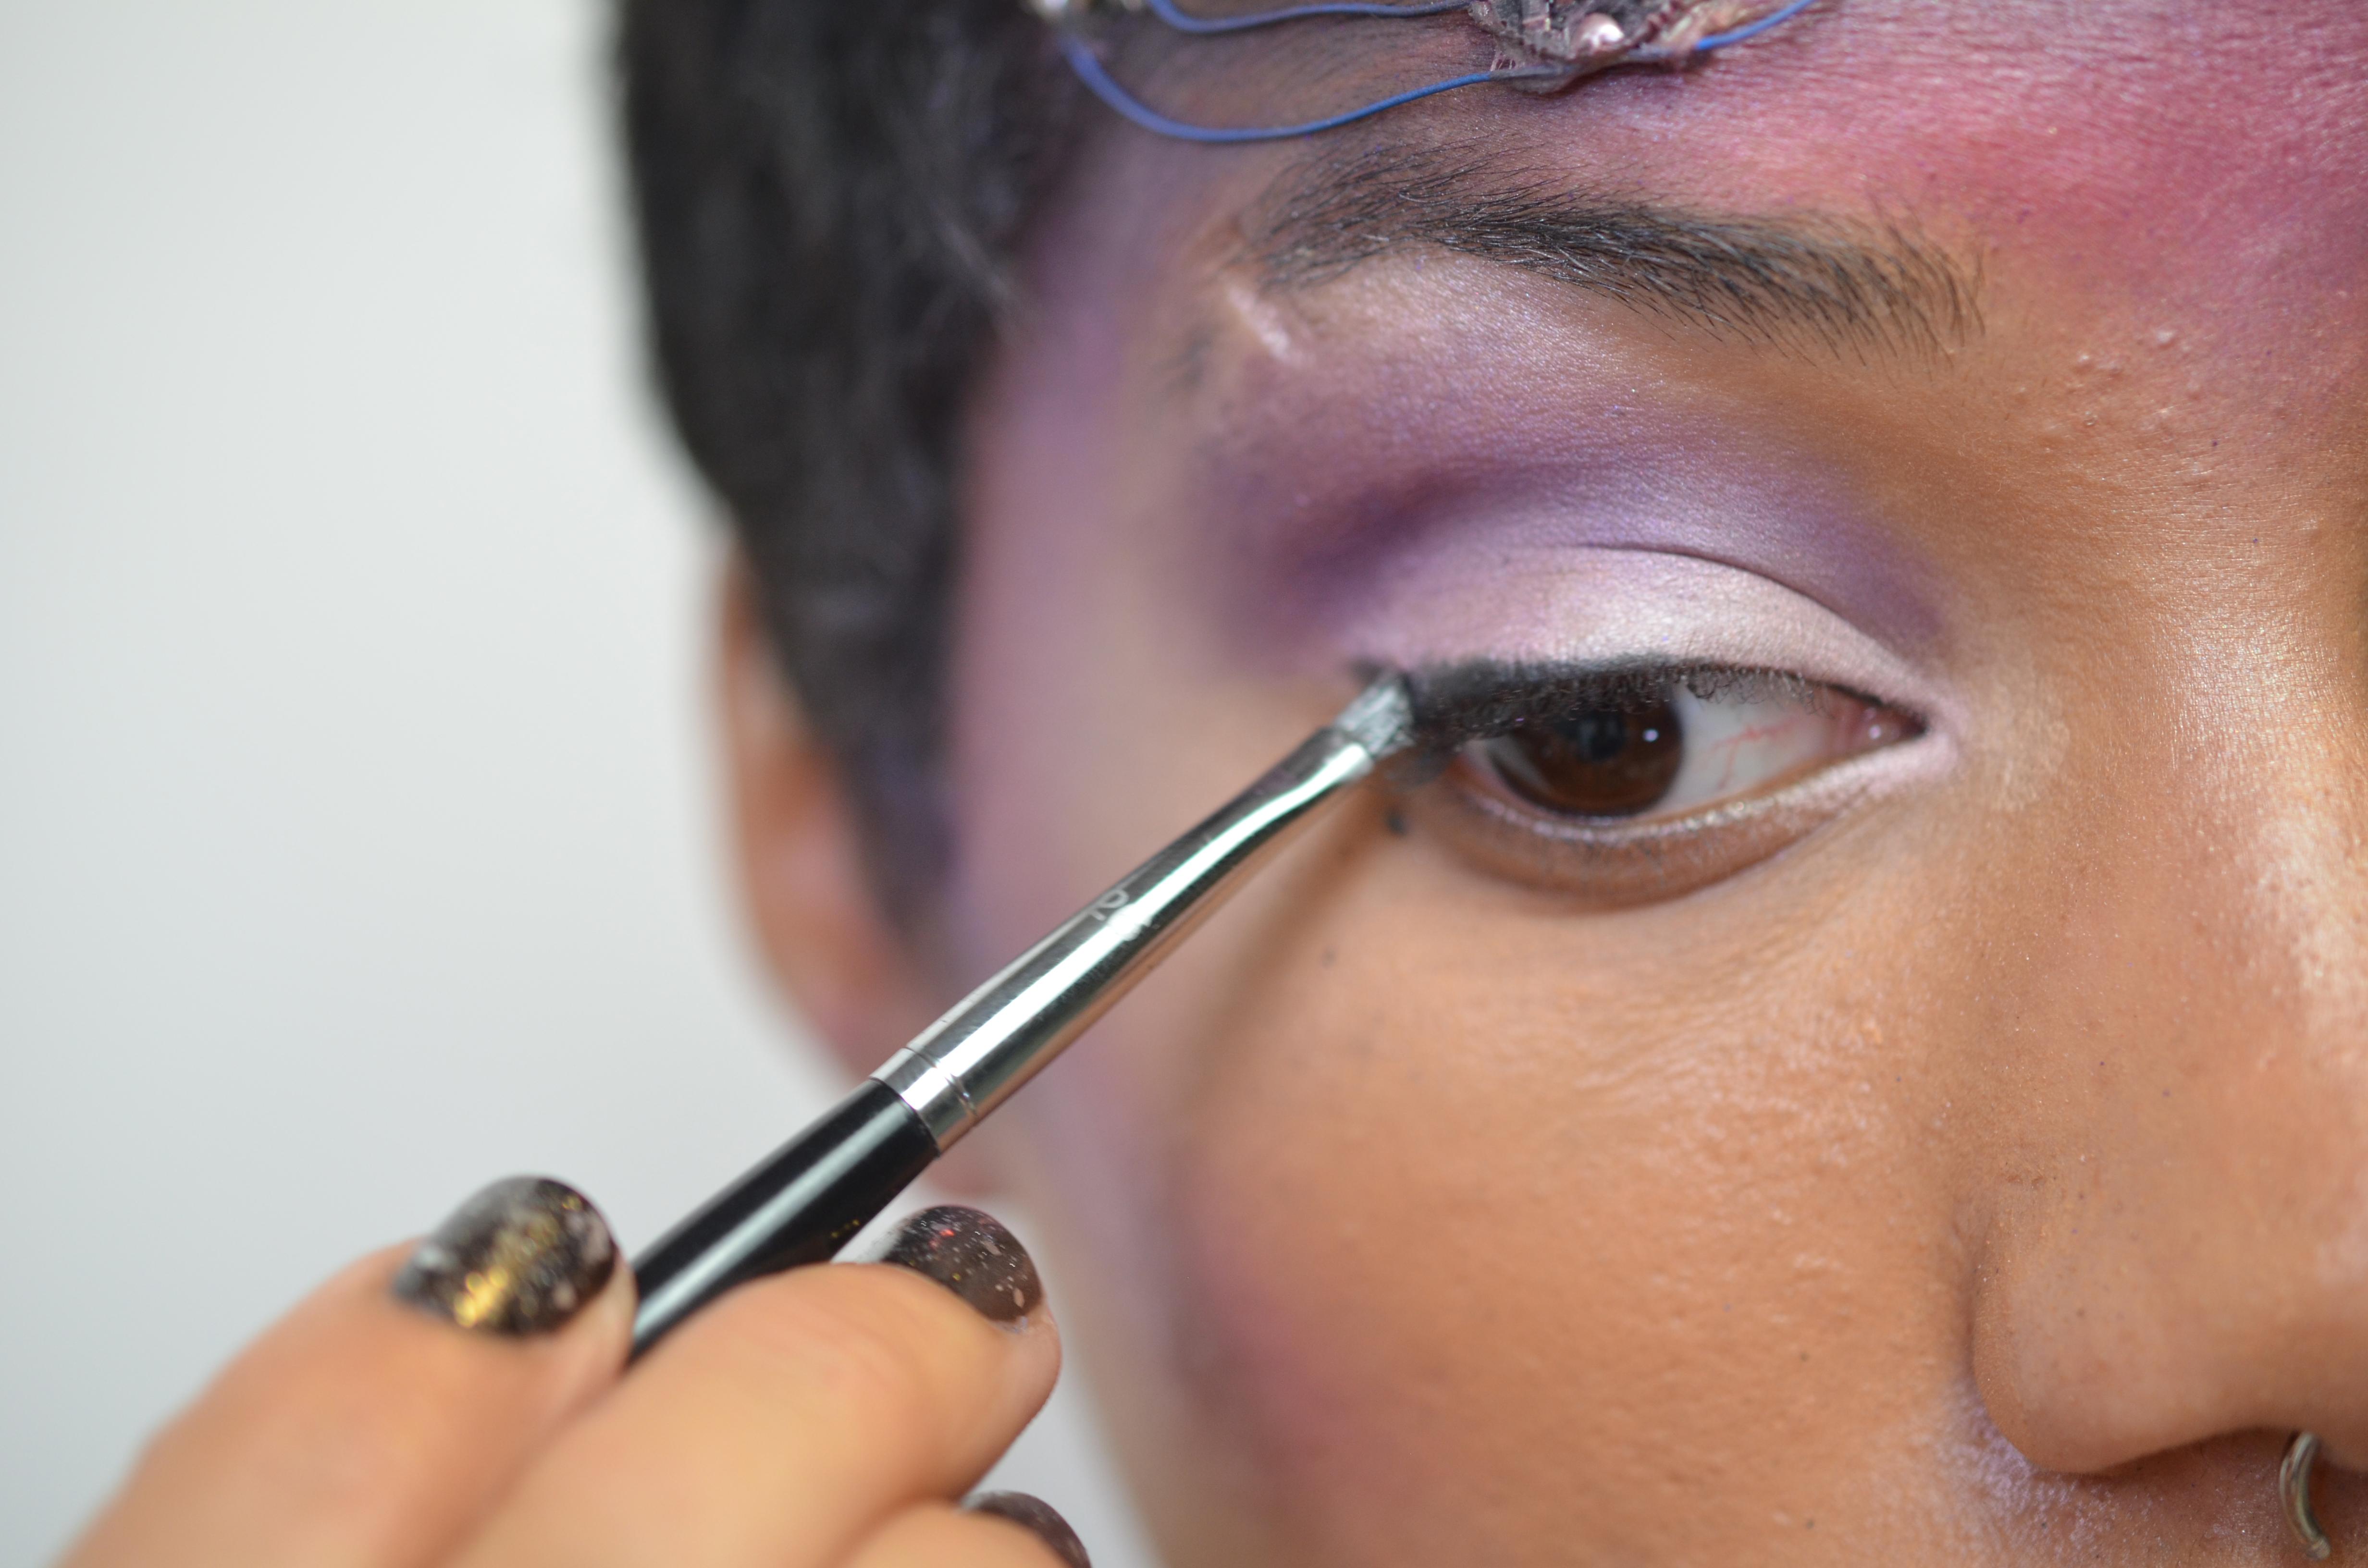 flora_space-face-LED-galaxy-makeup-21.jpg